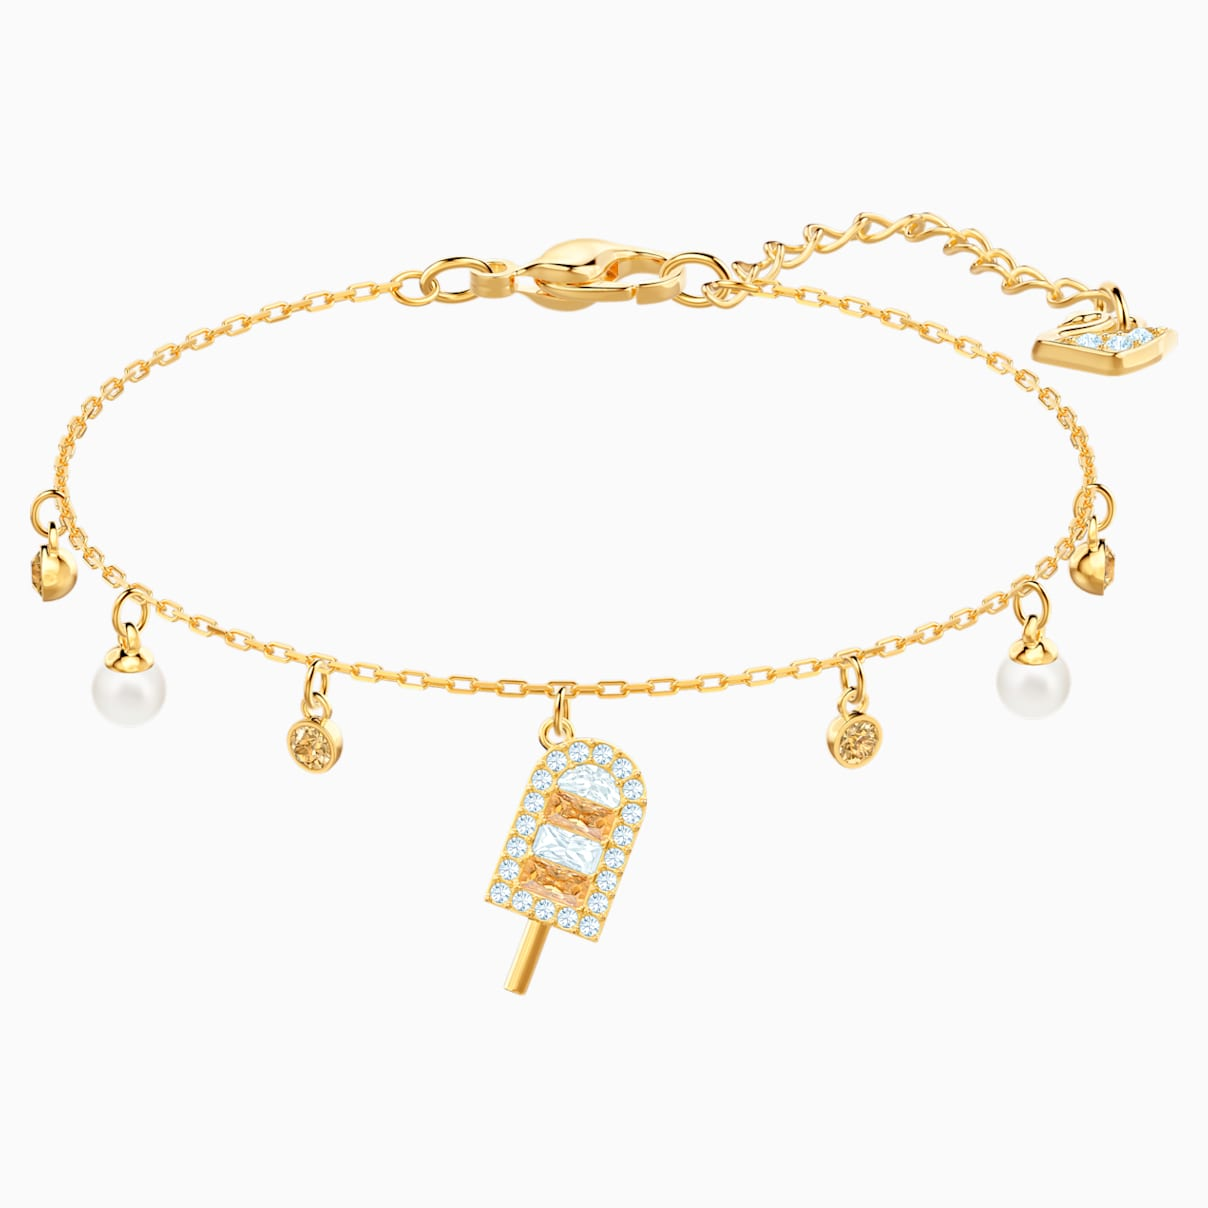 Levně Swarovski No Regrets Ice Cream Bracelet, Multi-colored, Gold-tone plated